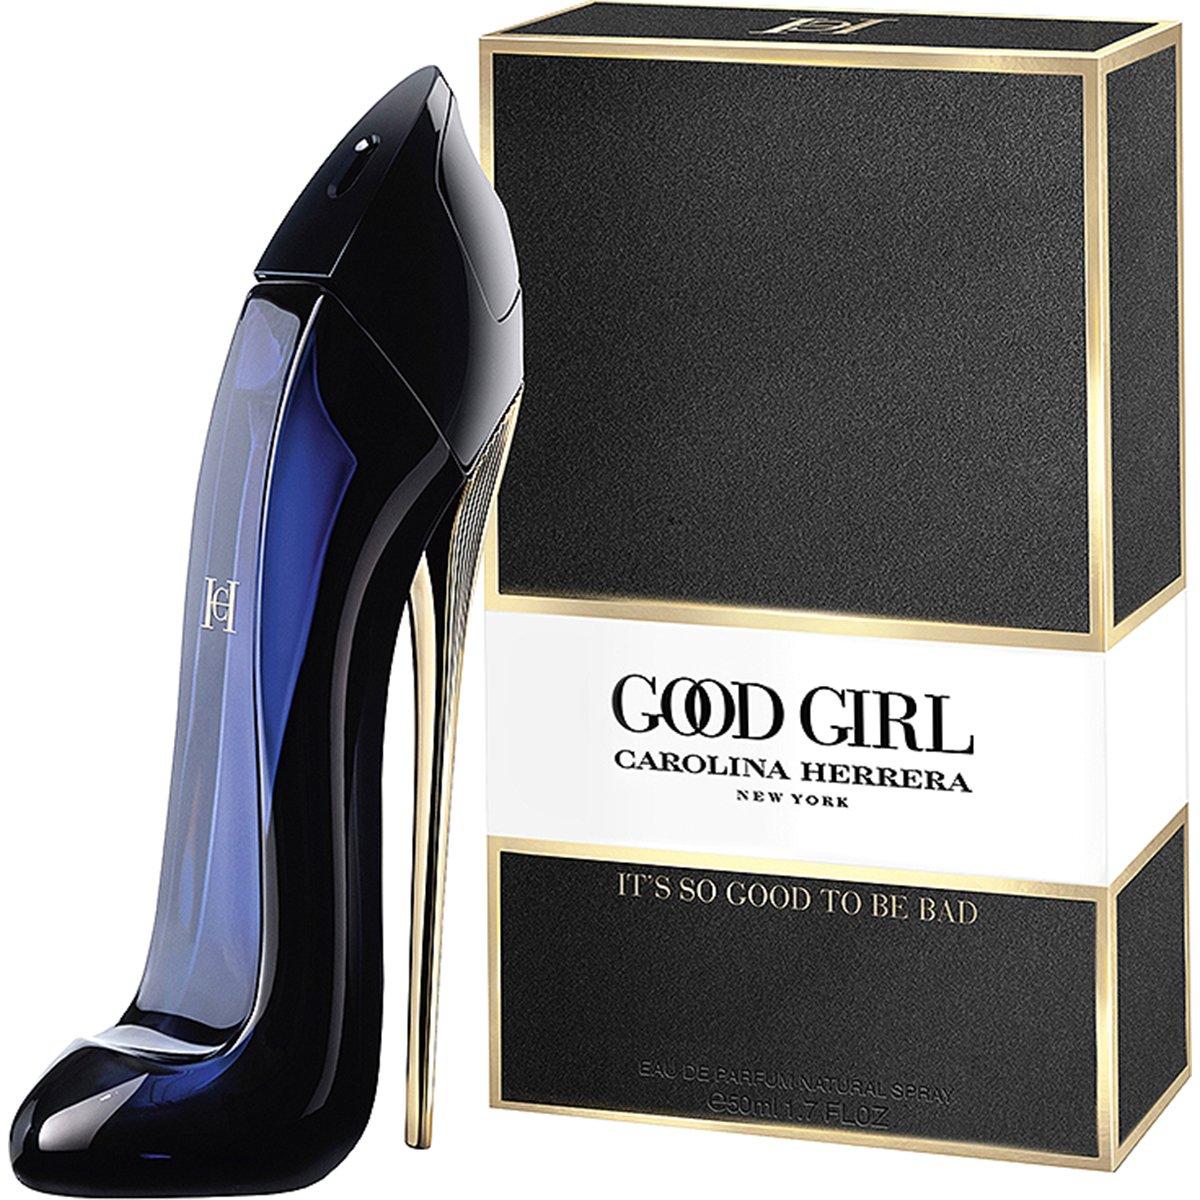 Perfume Feminino Good Girl Carolina Herrera Eau de Parfum 50ml - 1